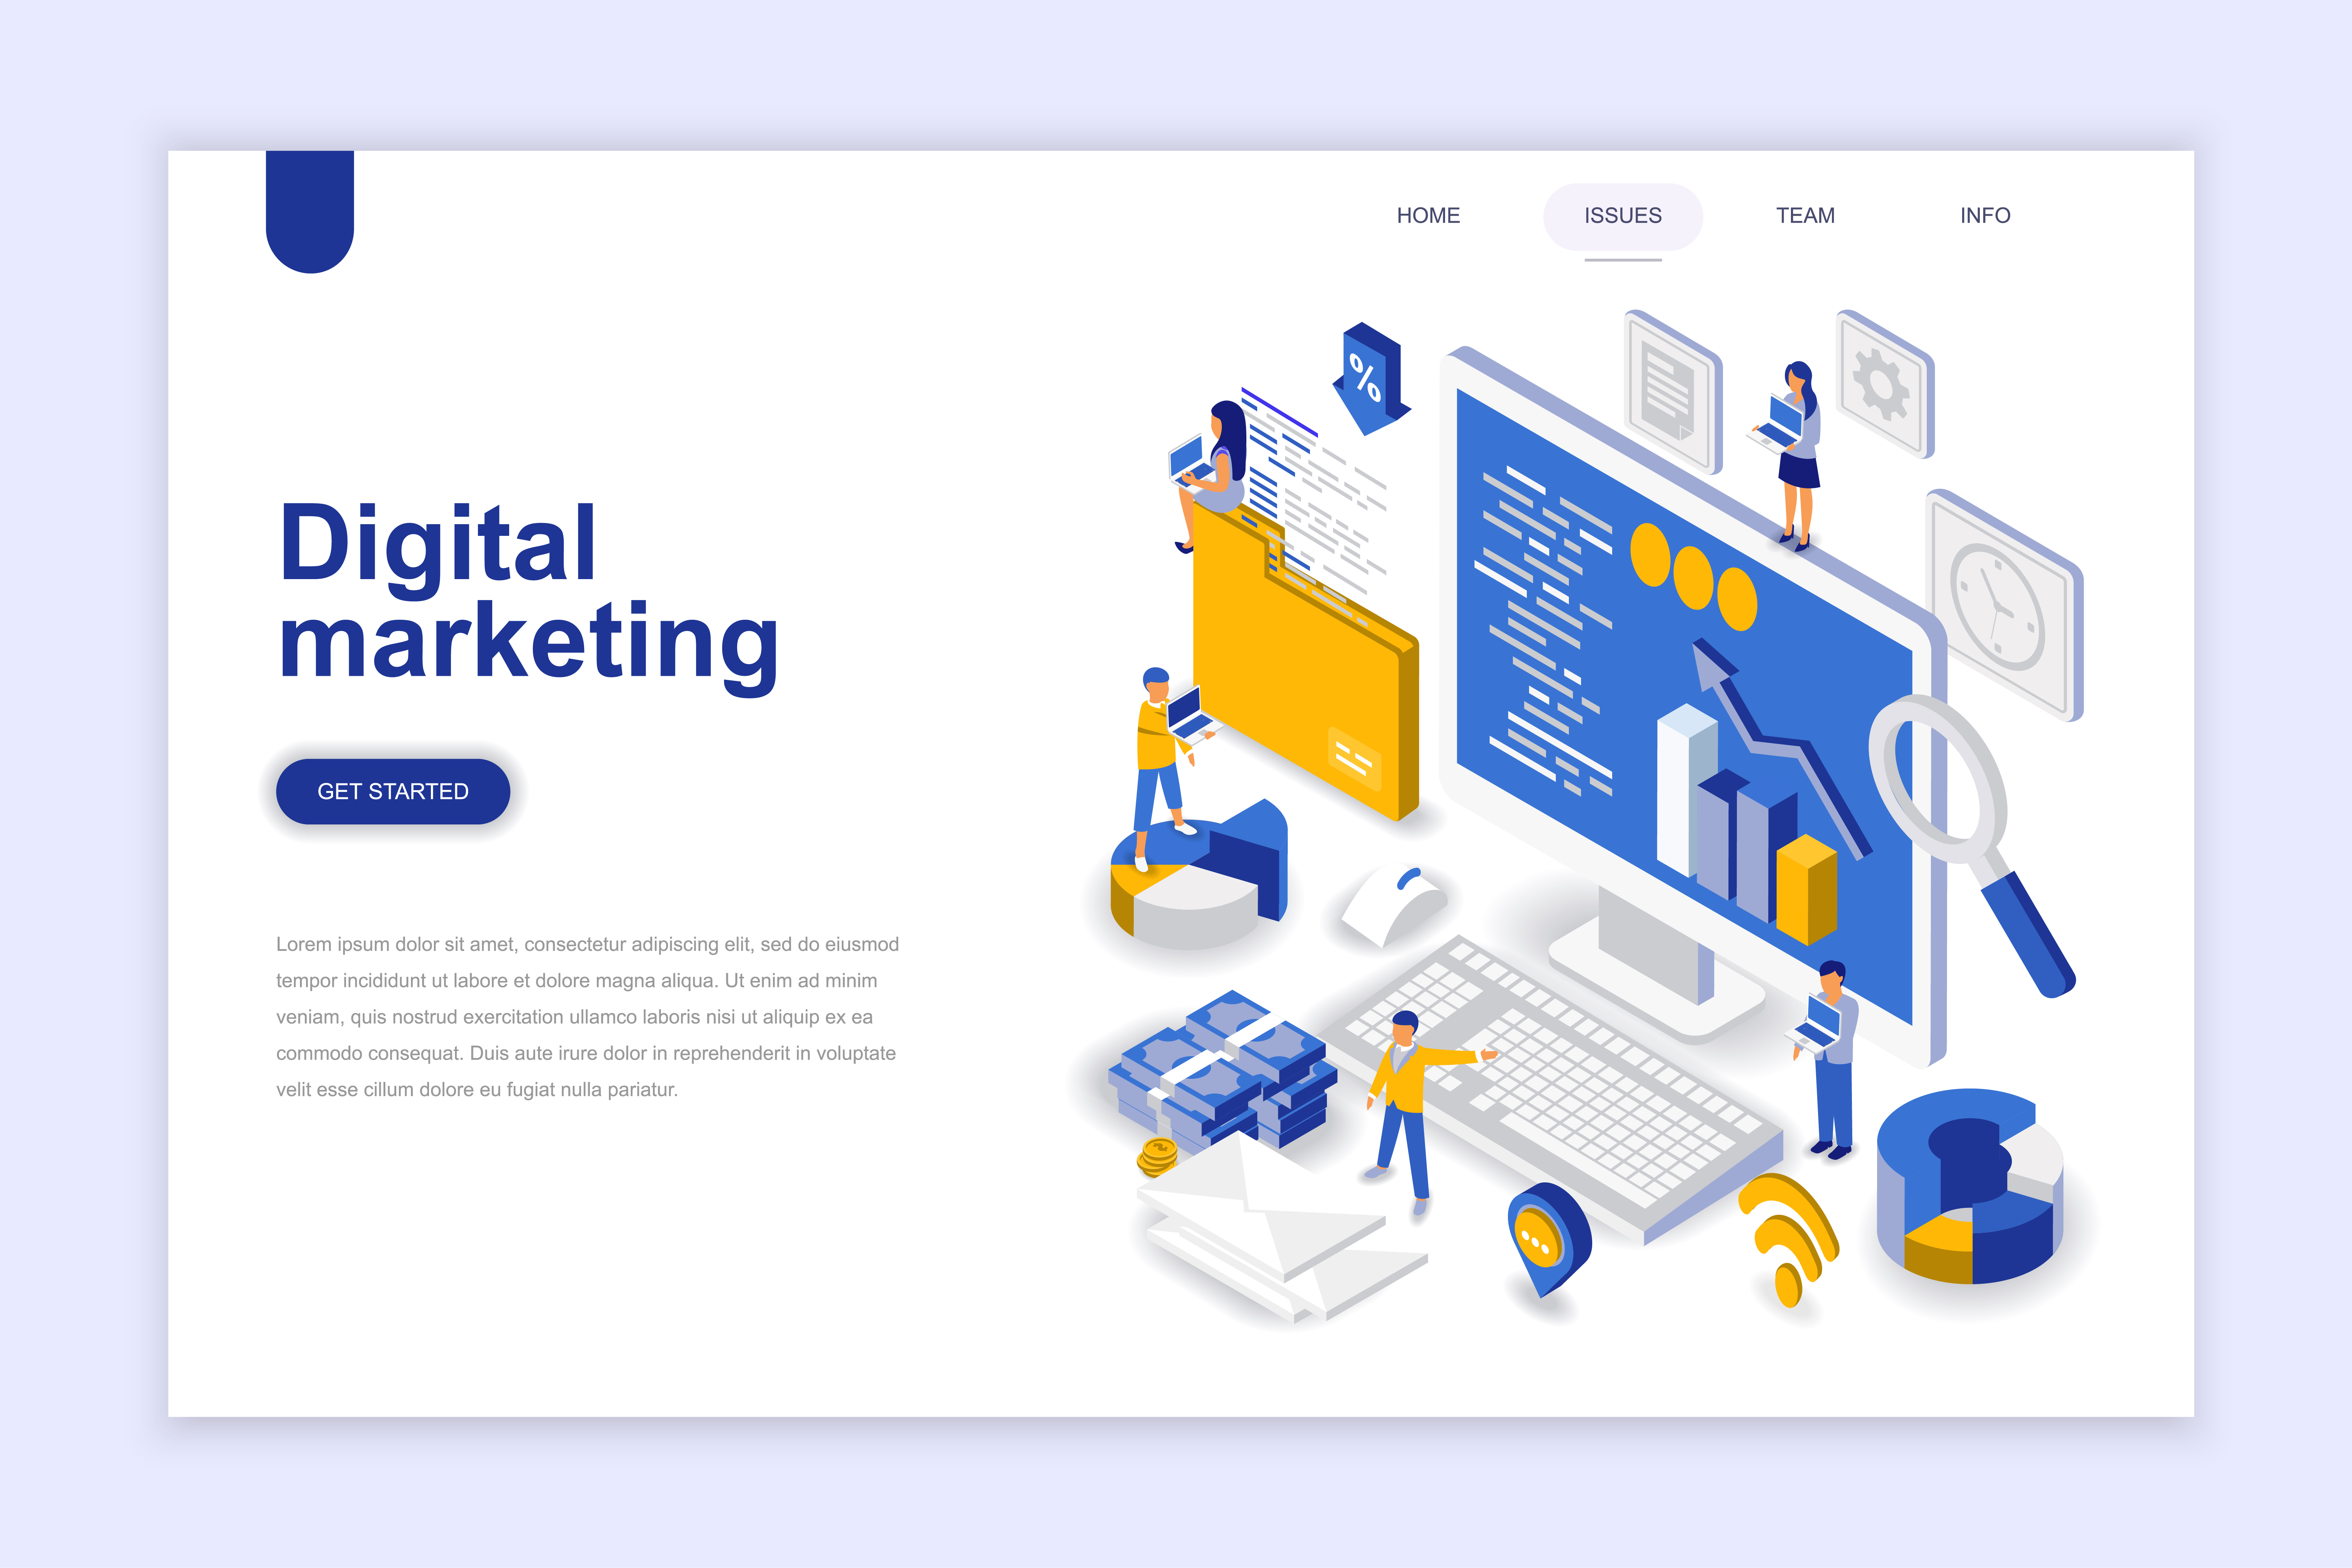 Vector Illustration Web Designs: Digital Marketing Modern Flat Design Isometric Concept